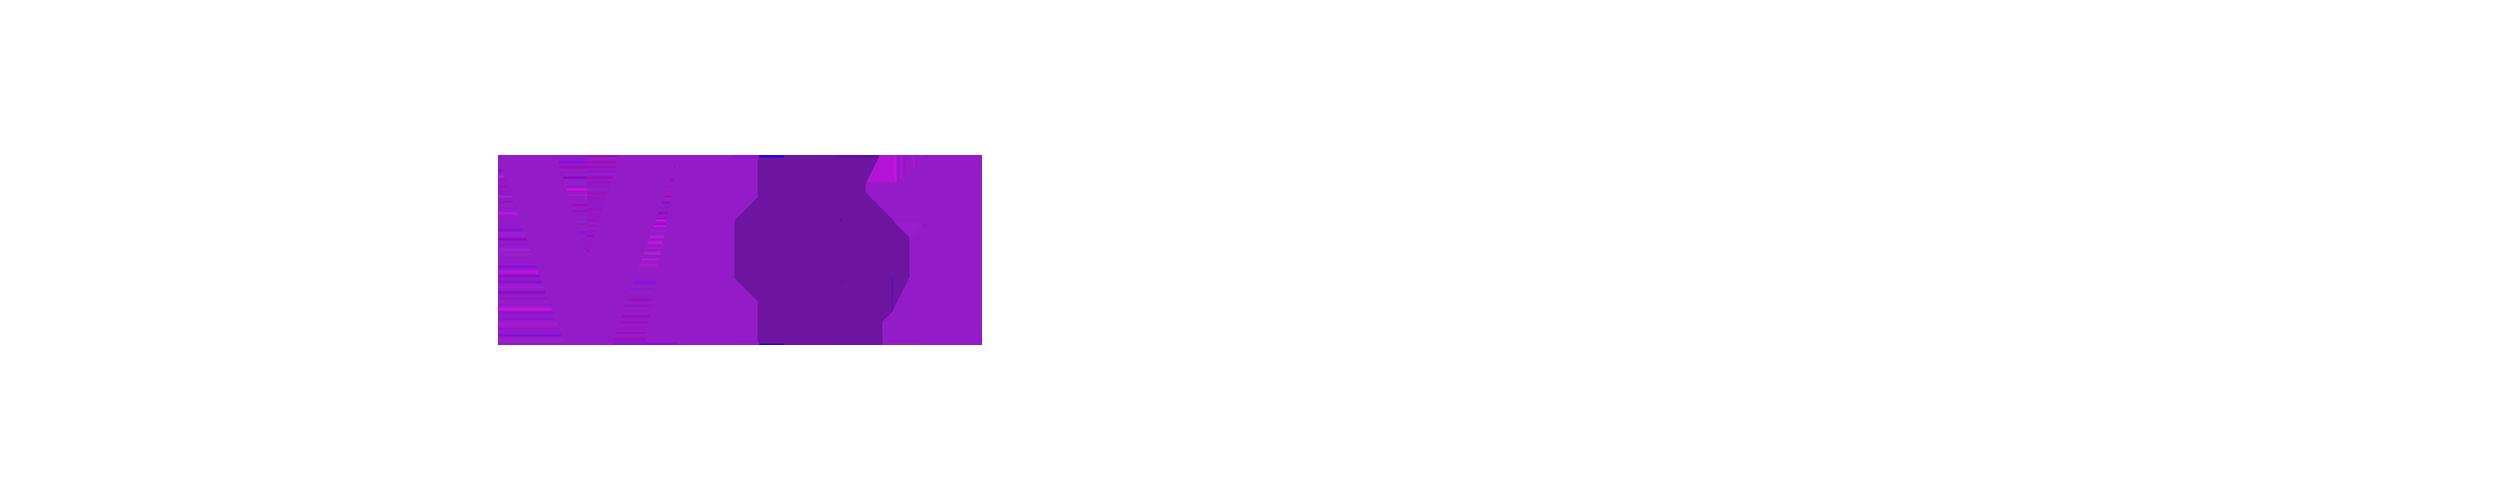 network logos pg4-v4.png